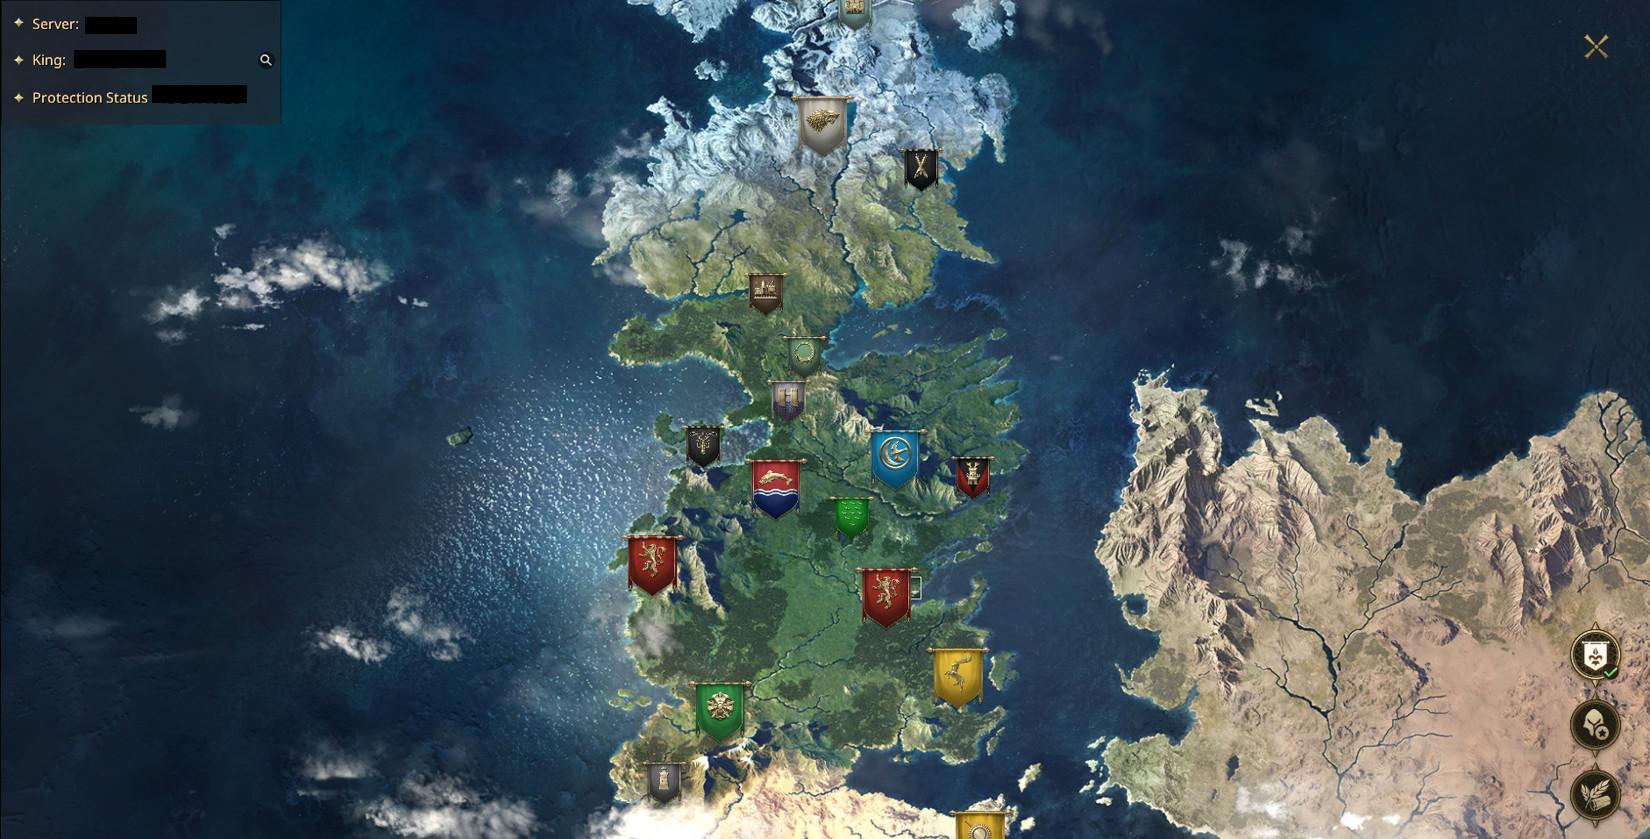 Game of Thrones Winter is Coming Fiyat Karşılaştırma